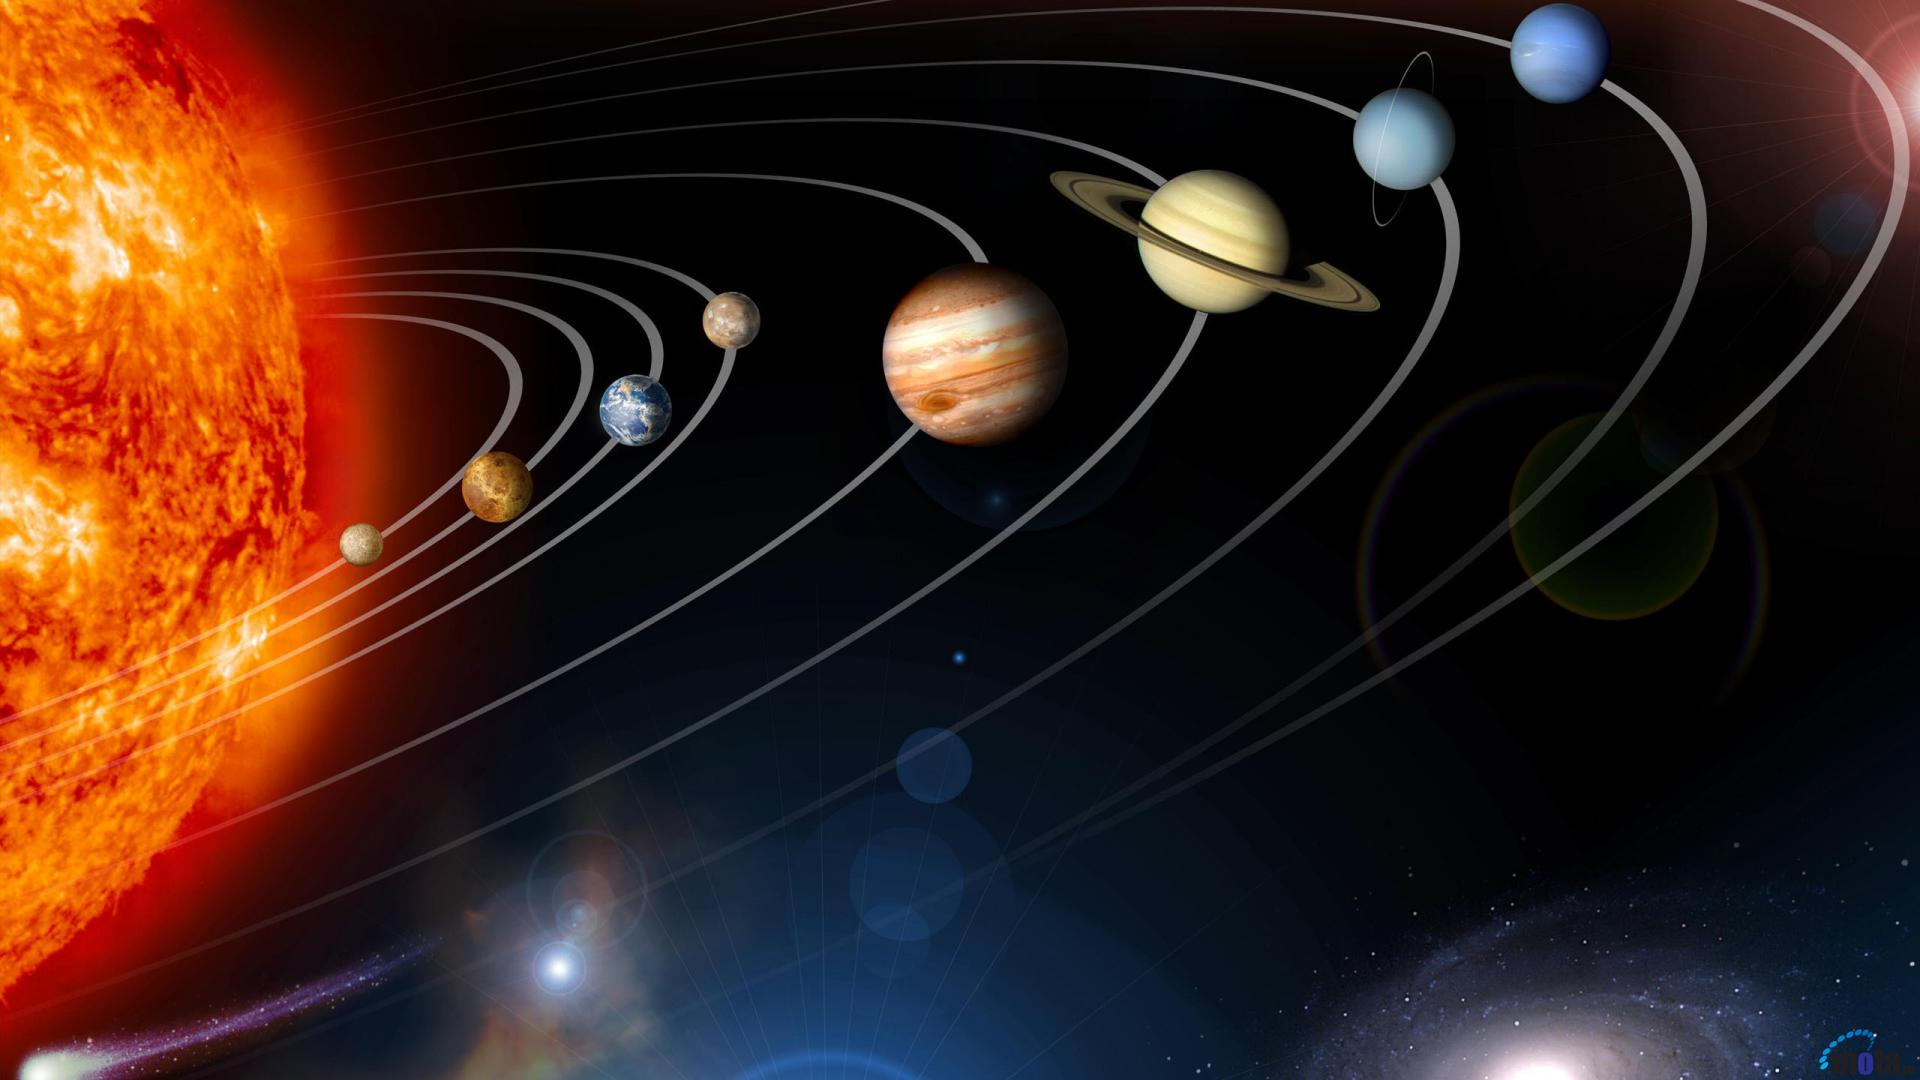 Solar System 4K Wallpapers